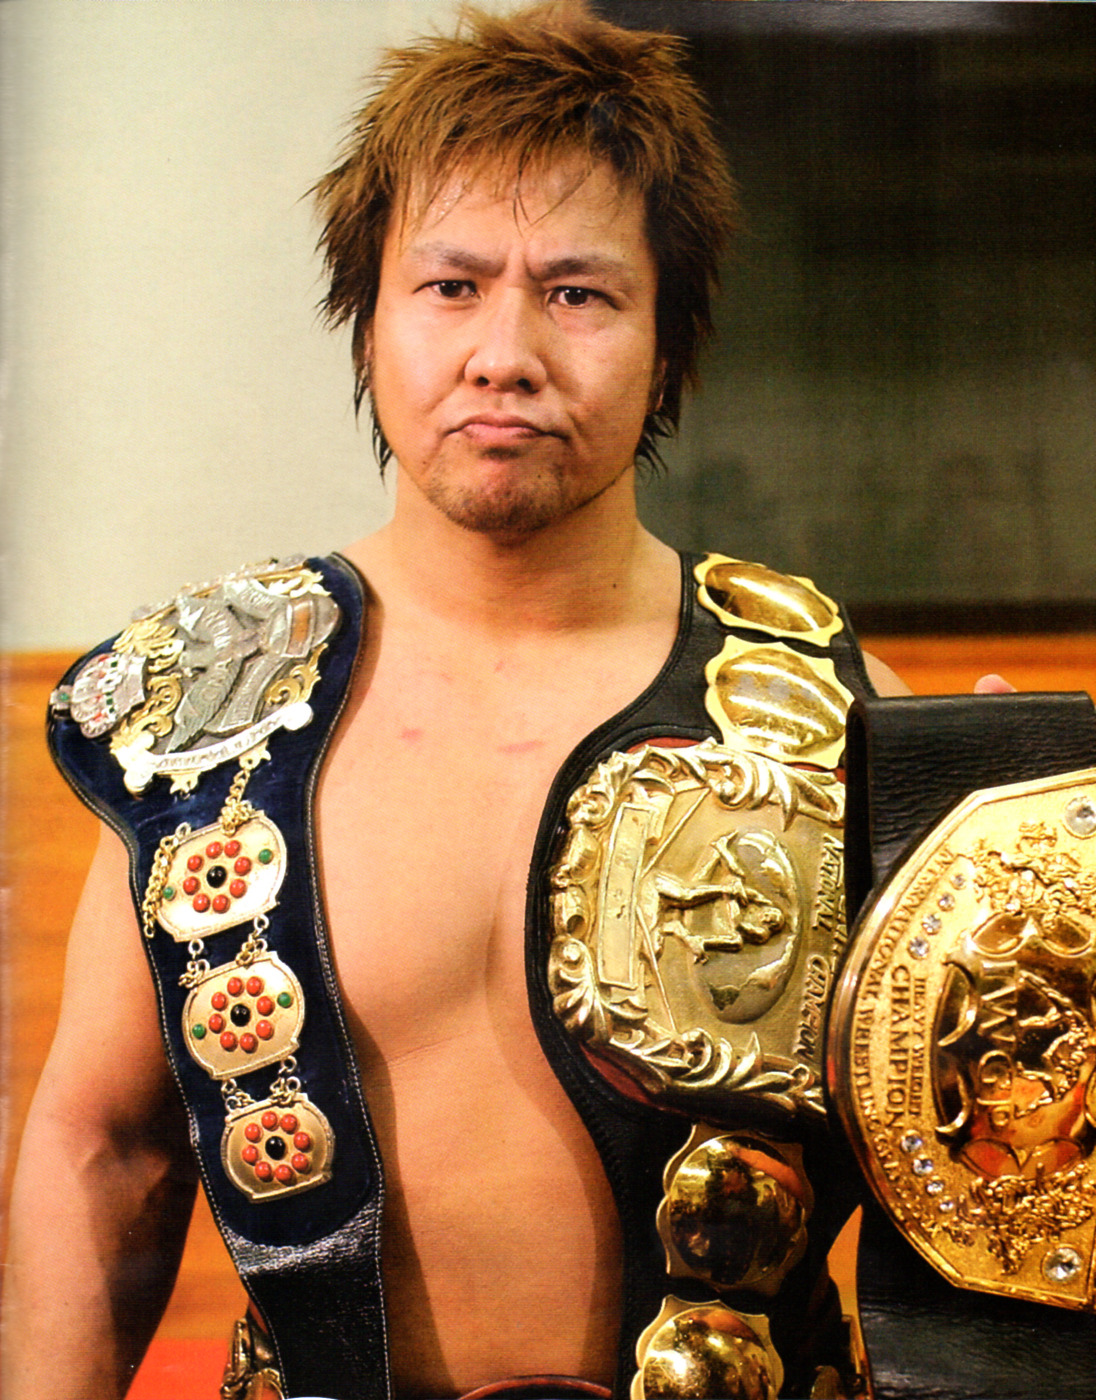 Satoshi Kojima with his multiple world titles.